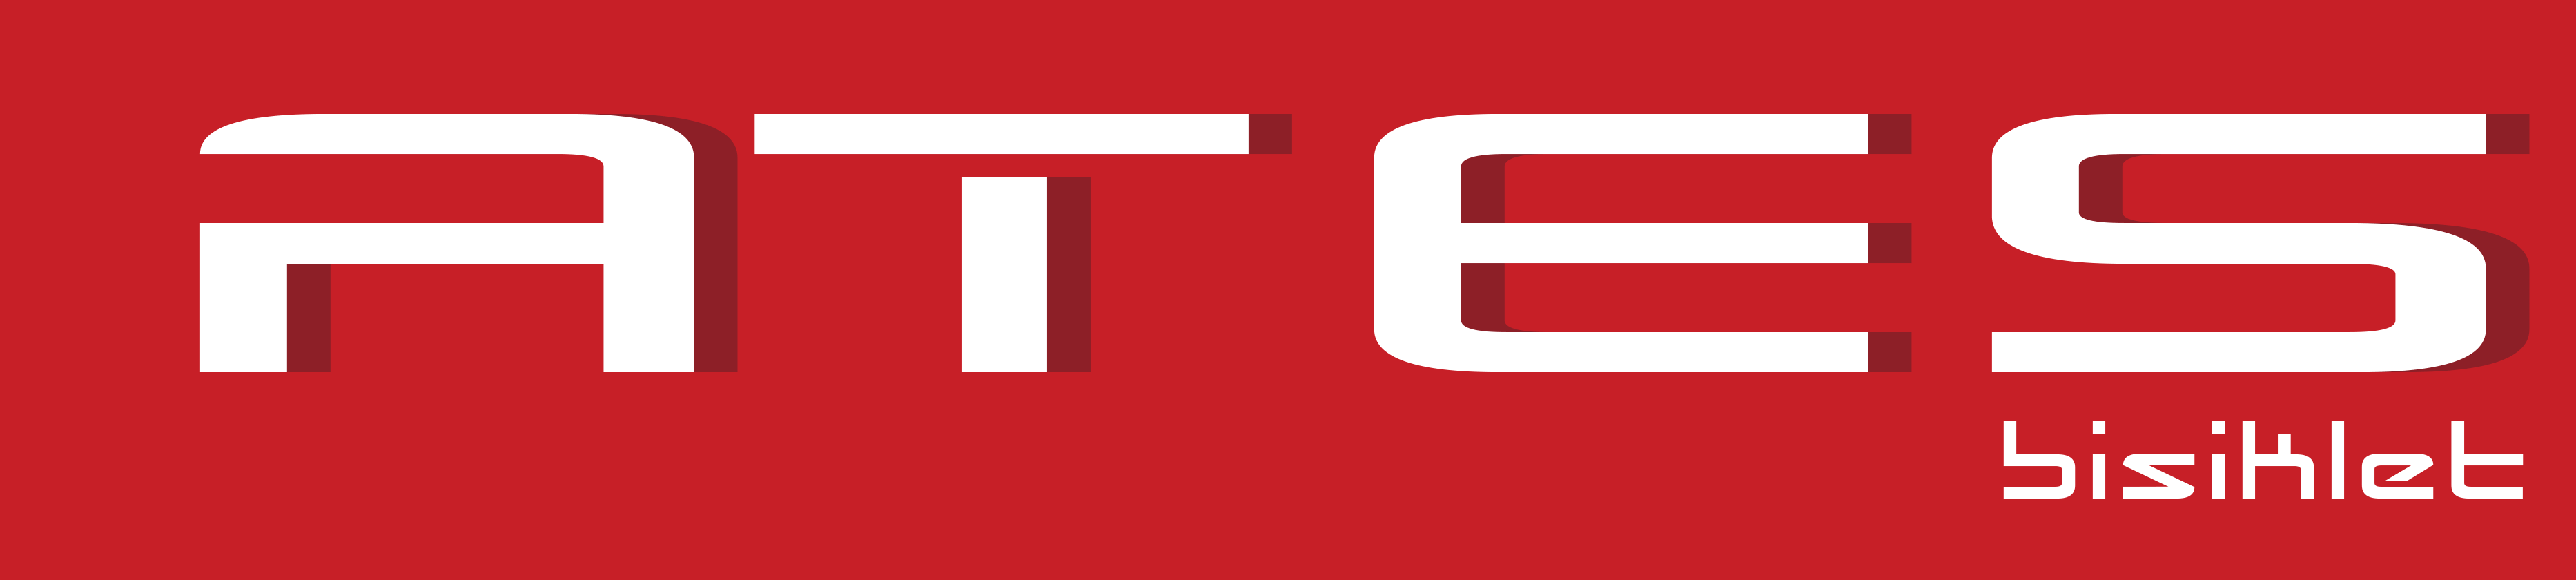 Ates-Bisiklet-Logo-AtessanGrup.png